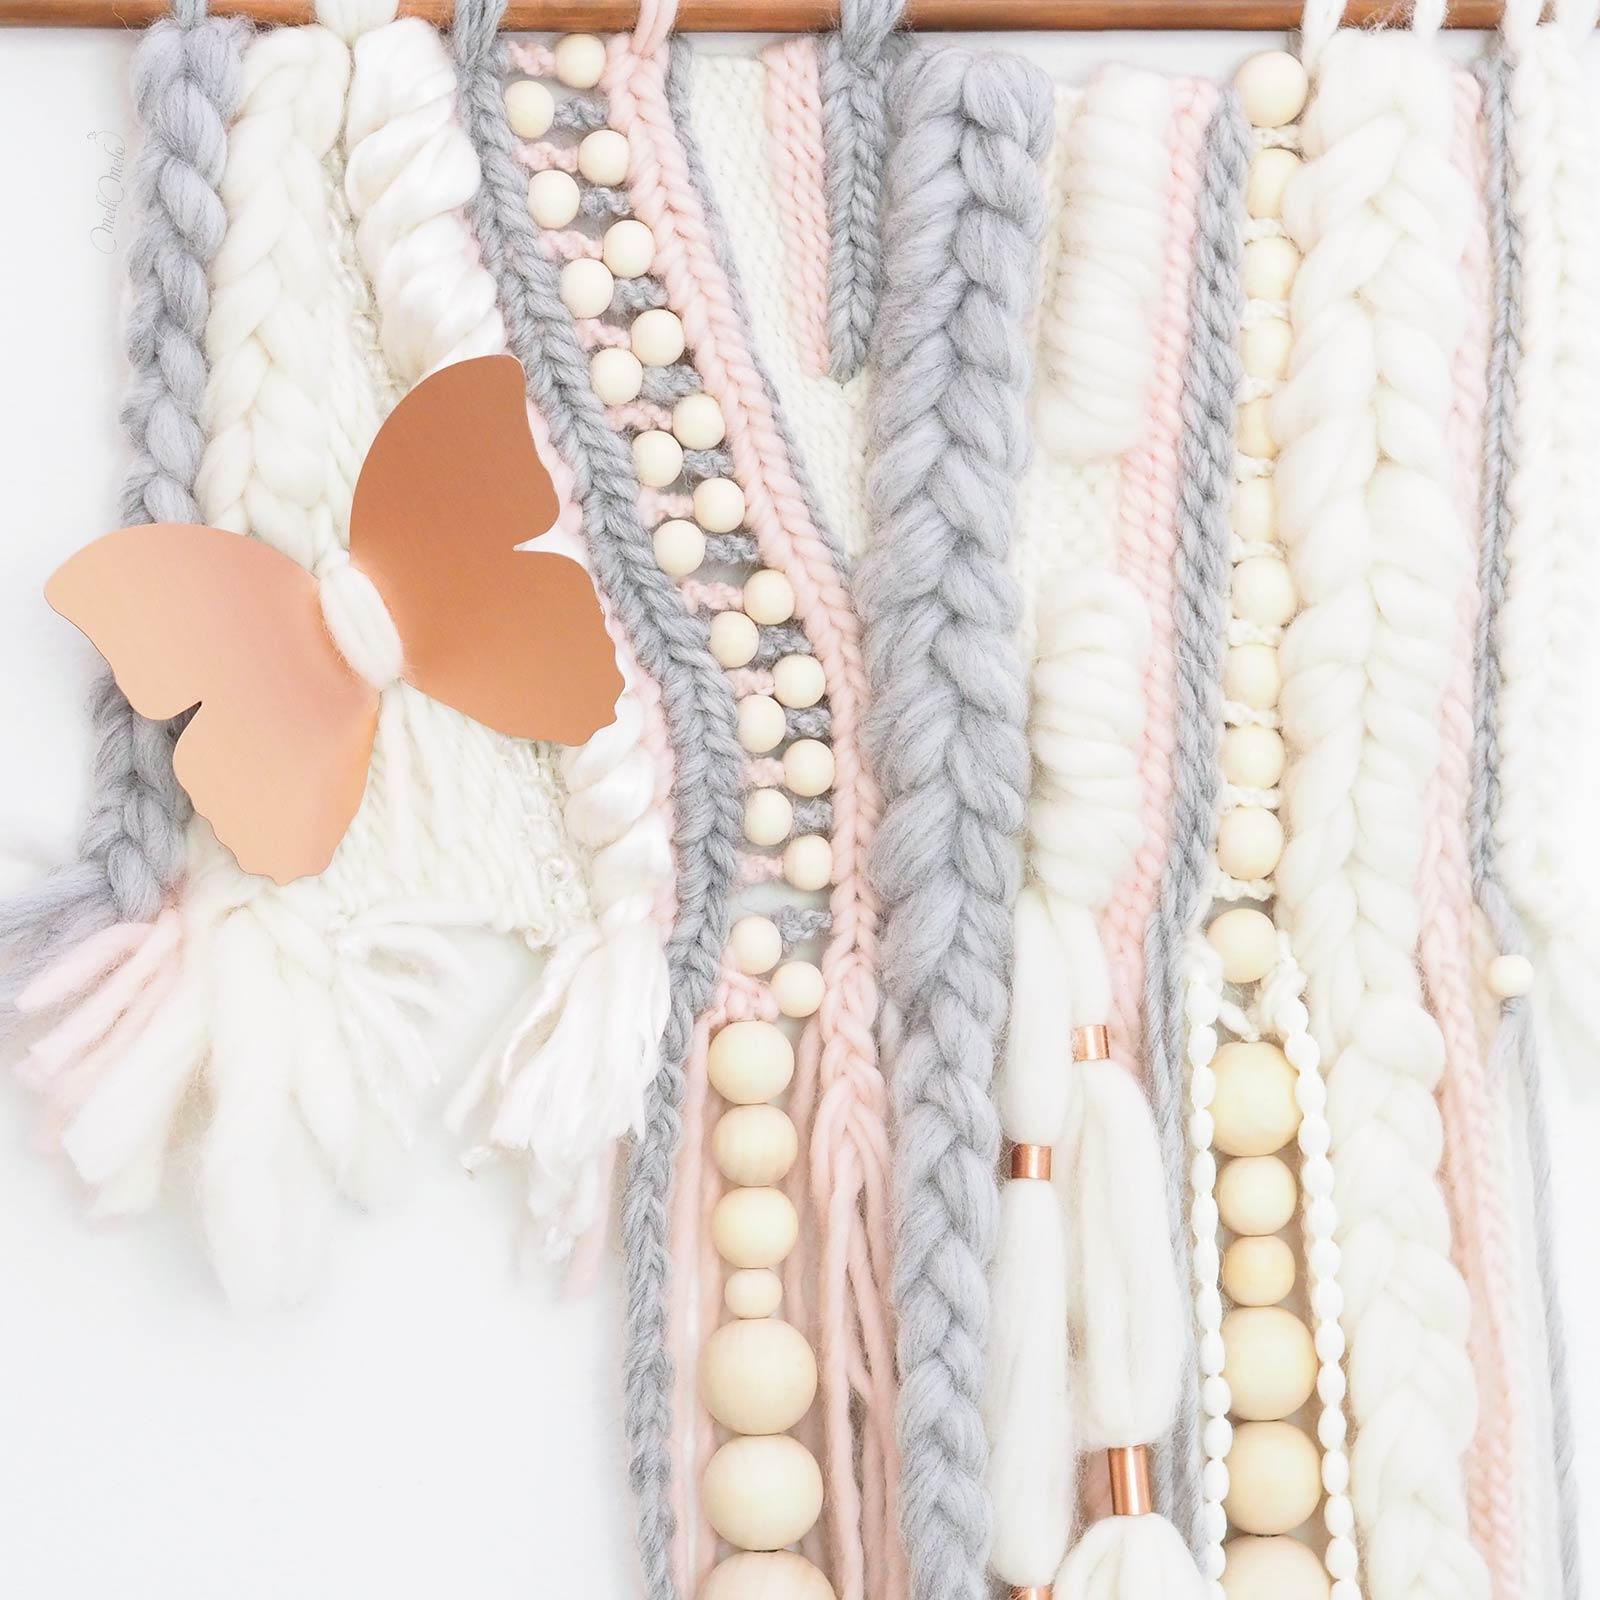 Tissage format paysage papillon cuivre bois rose laine merino wool woolandthegang handweaving laboutiquedemelimelo